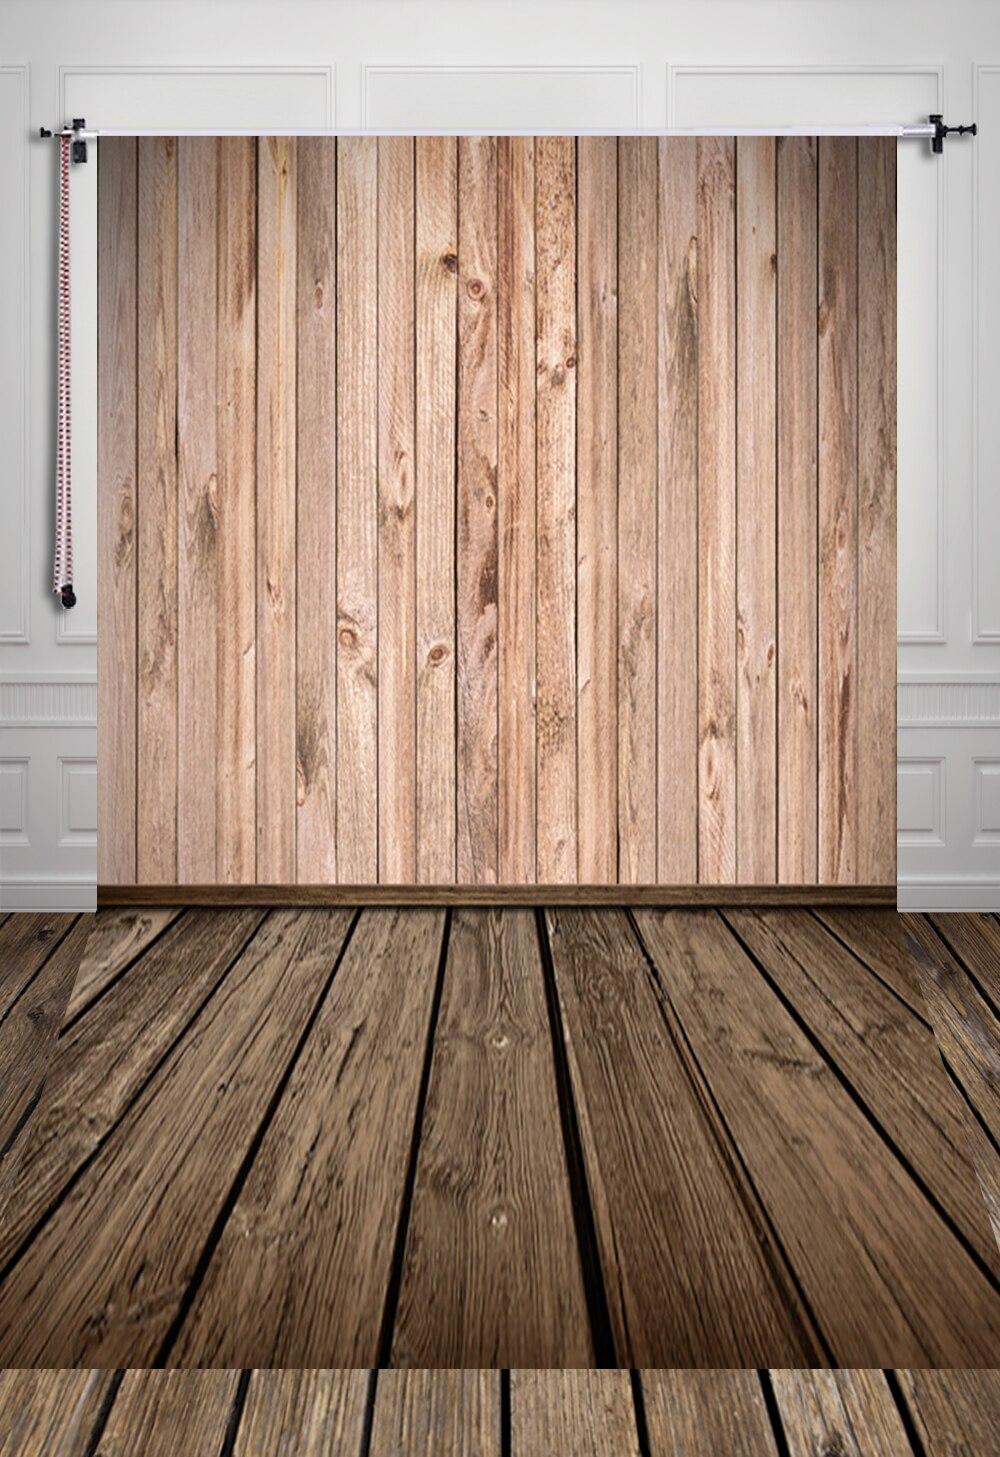 150*220CM Photography Background Wood Floor  Digital Printing Newborn Backdrops For Photo Studio D-7446